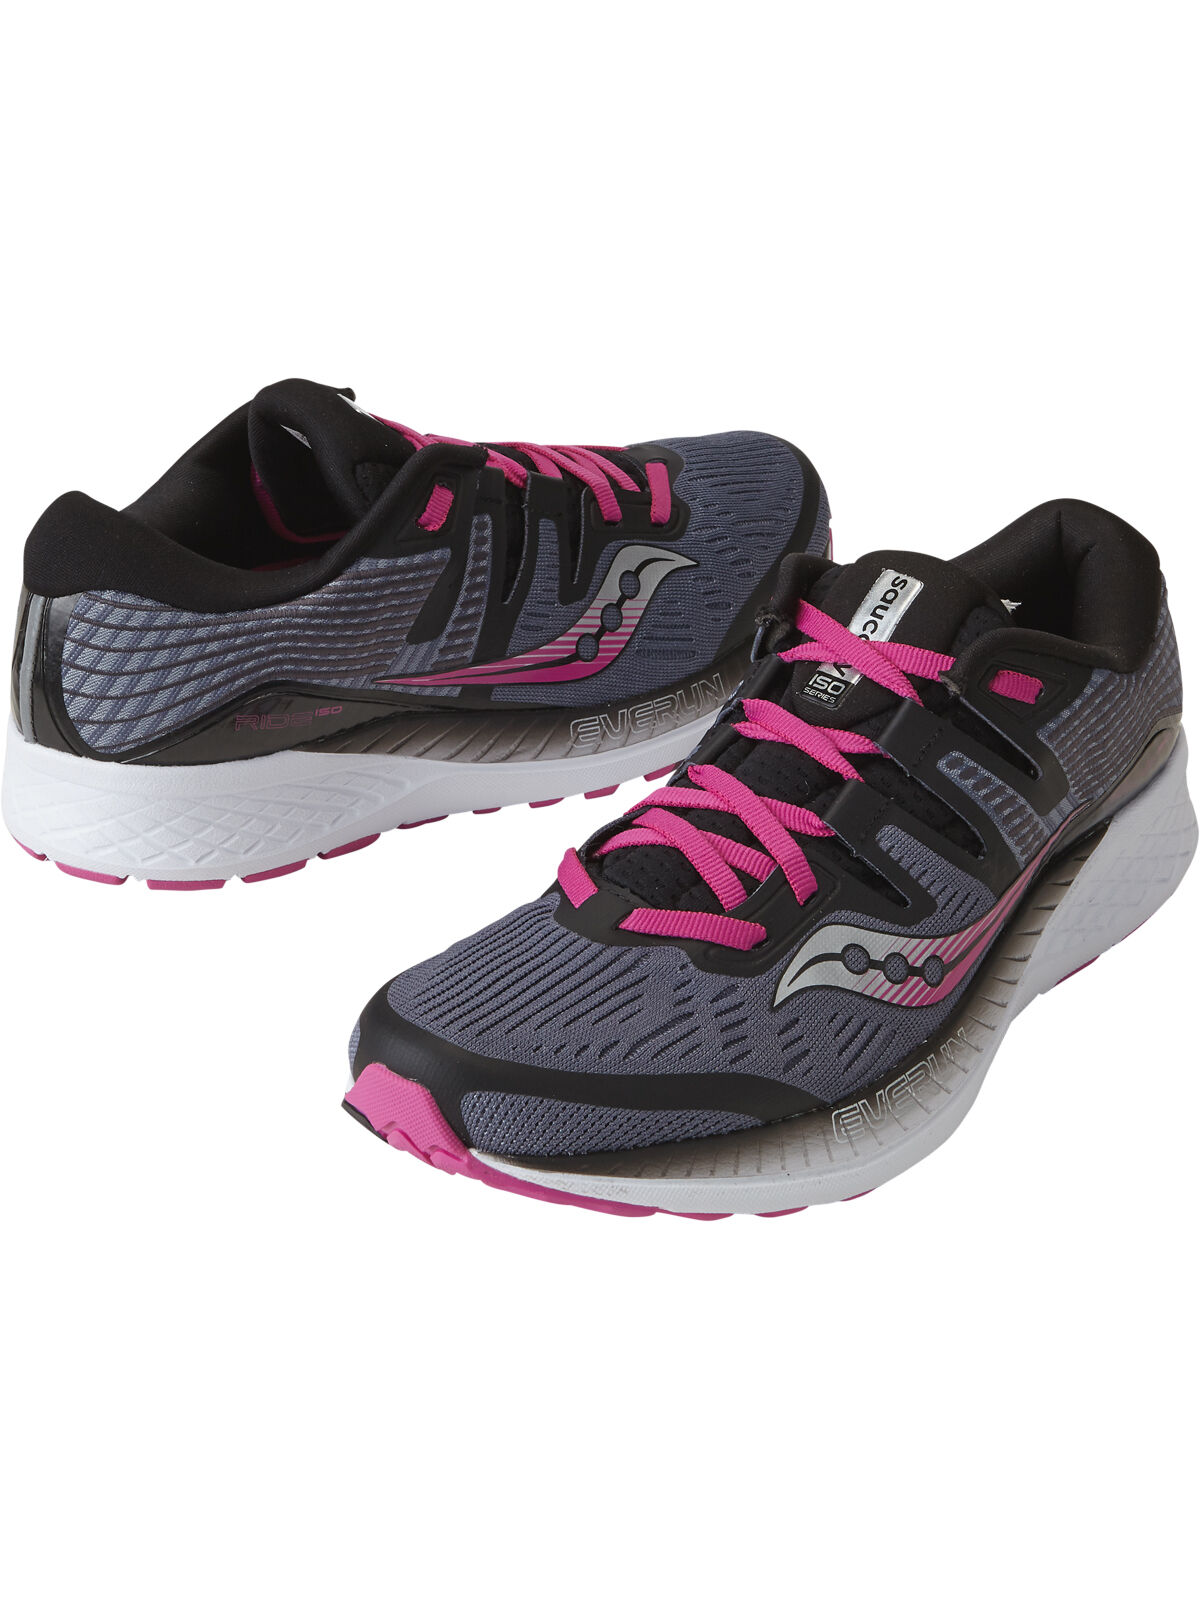 Legendary Running Shoe - Updated